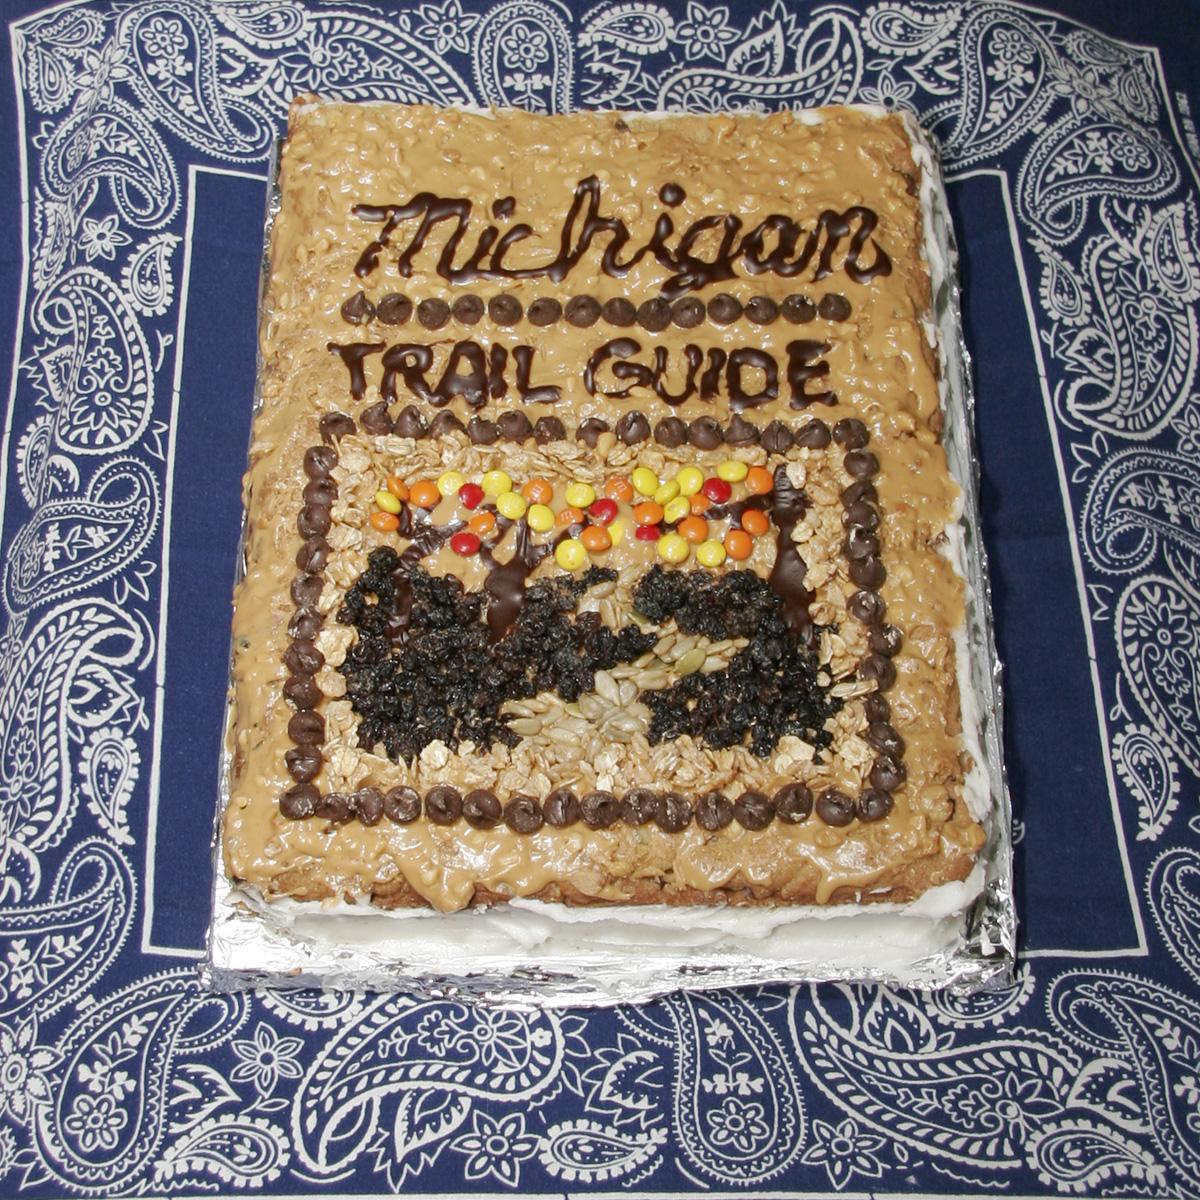 """Michigan Trail Guide"" created by Jean Stevens, 2010 KBAC Edible Book Festival"